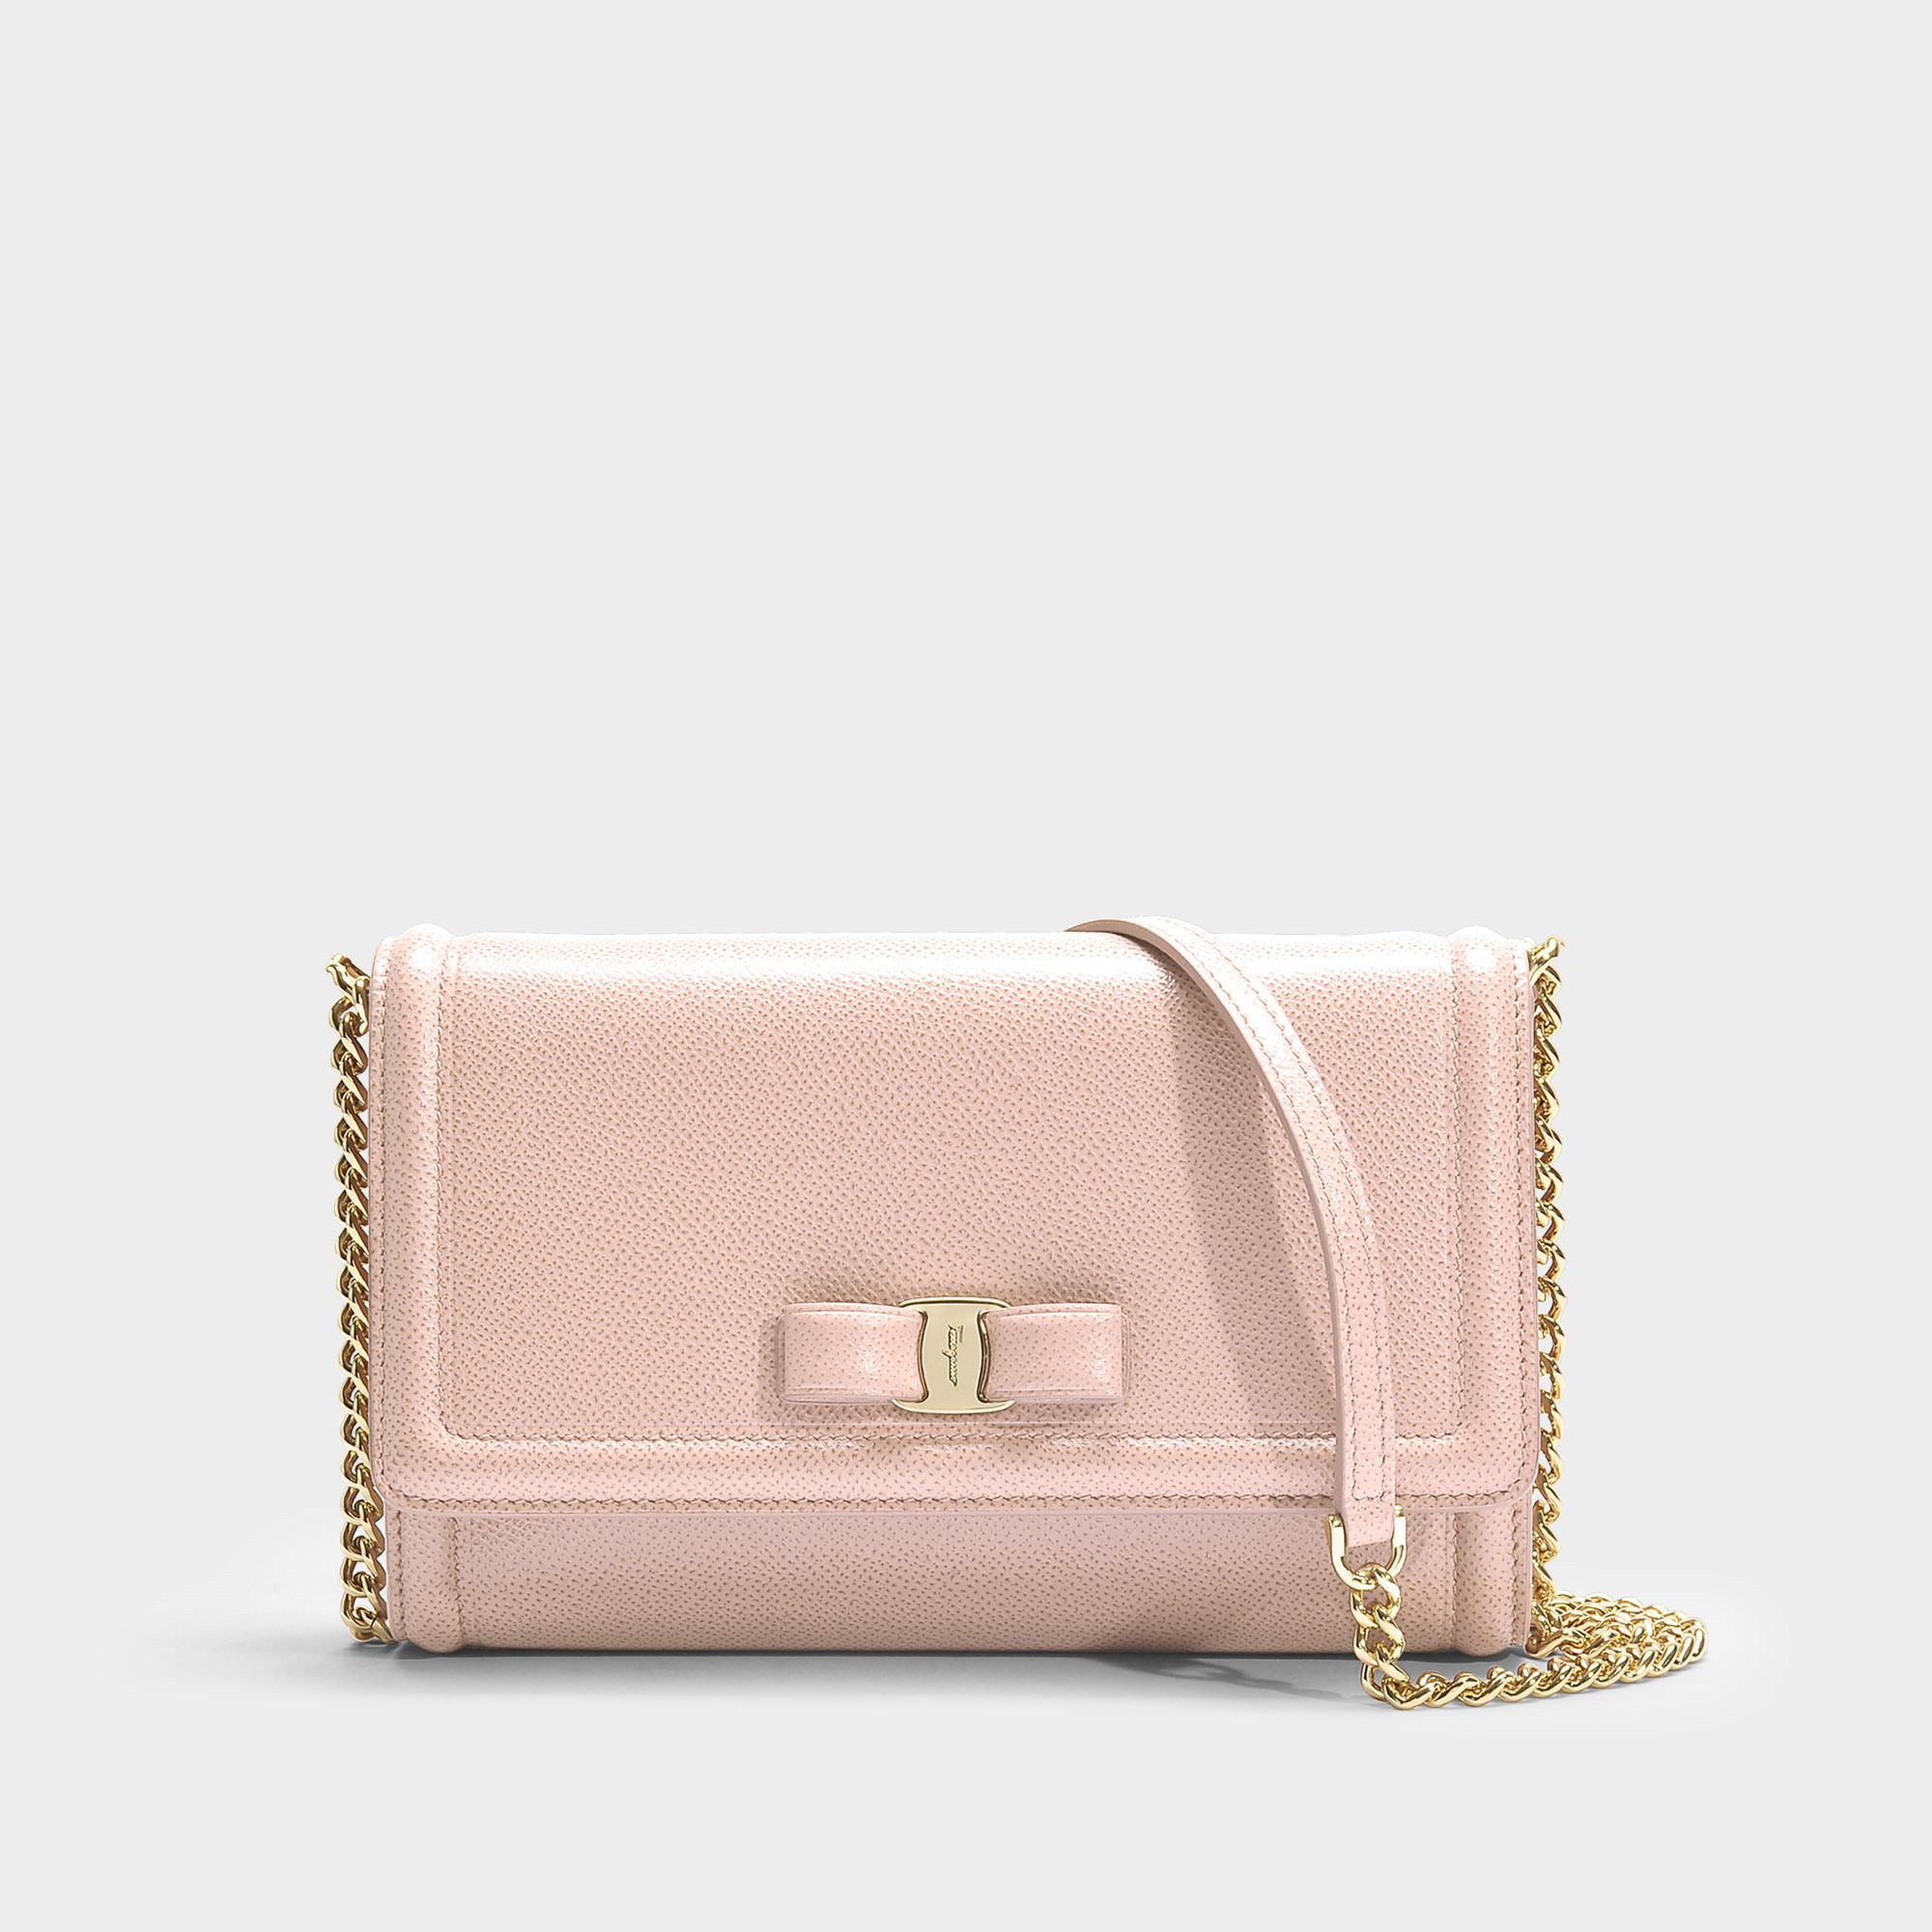 5d7e24d5880a Ferragamo Ginny Small Flap Bag In Pink Calfskin in Pink - Lyst